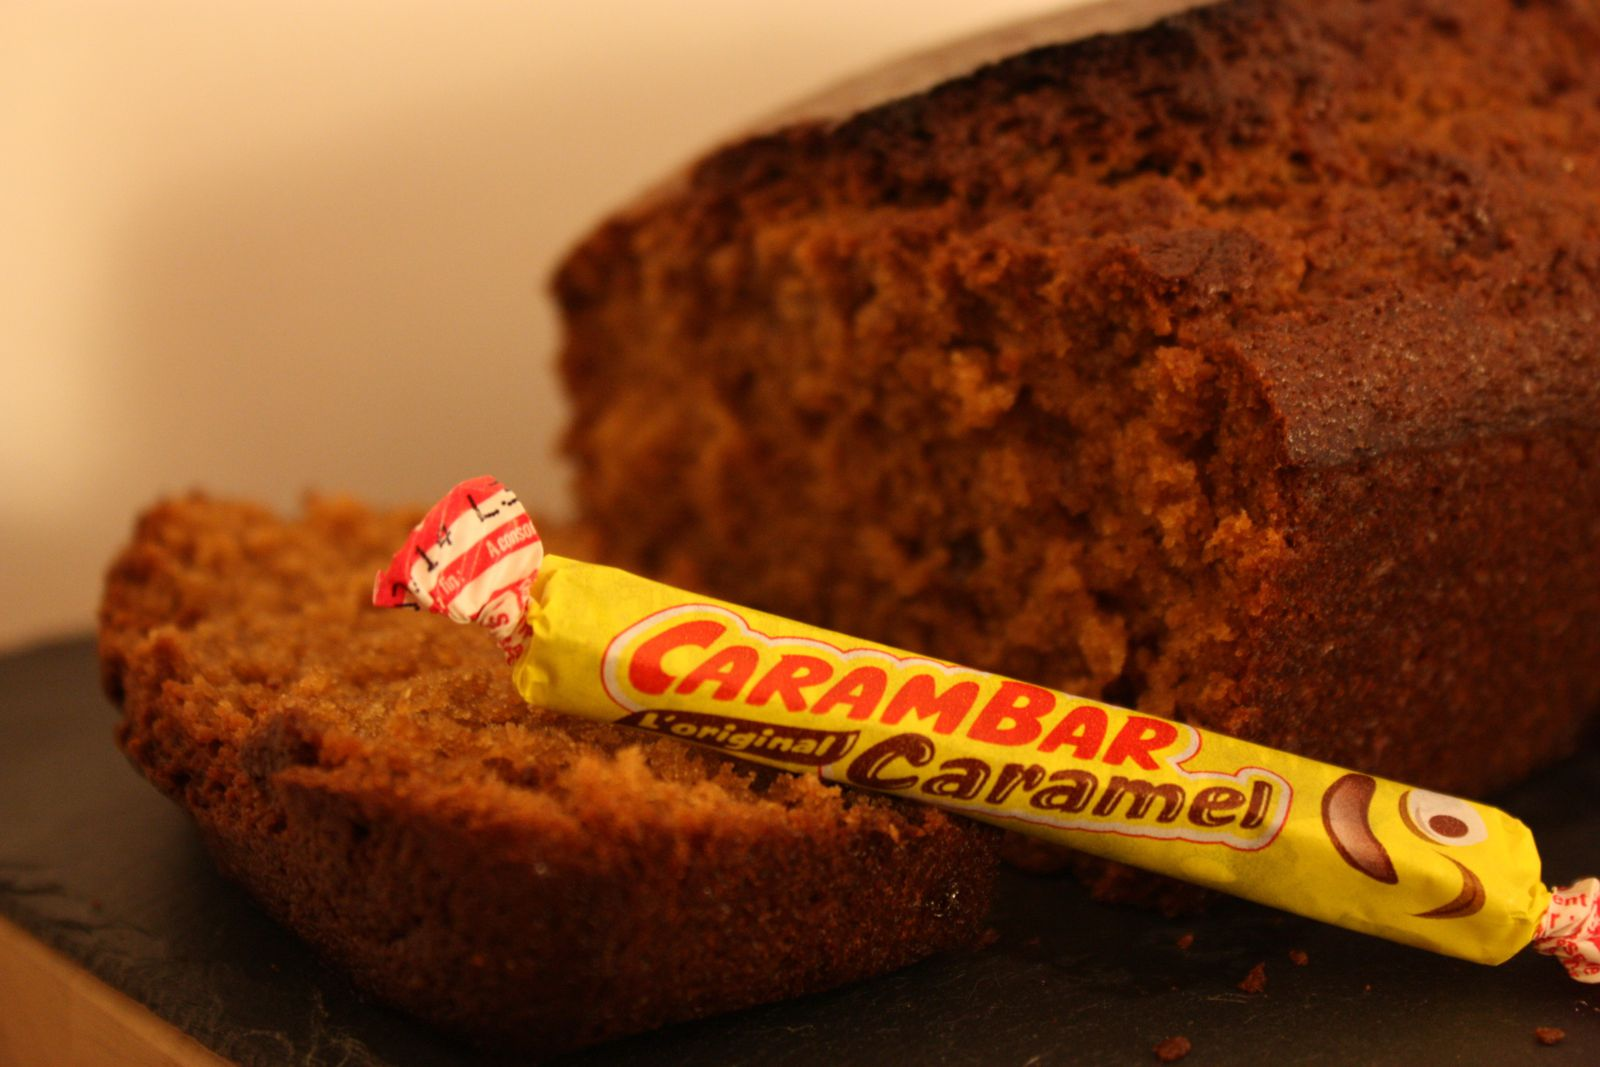 Cake Carambar au caramel